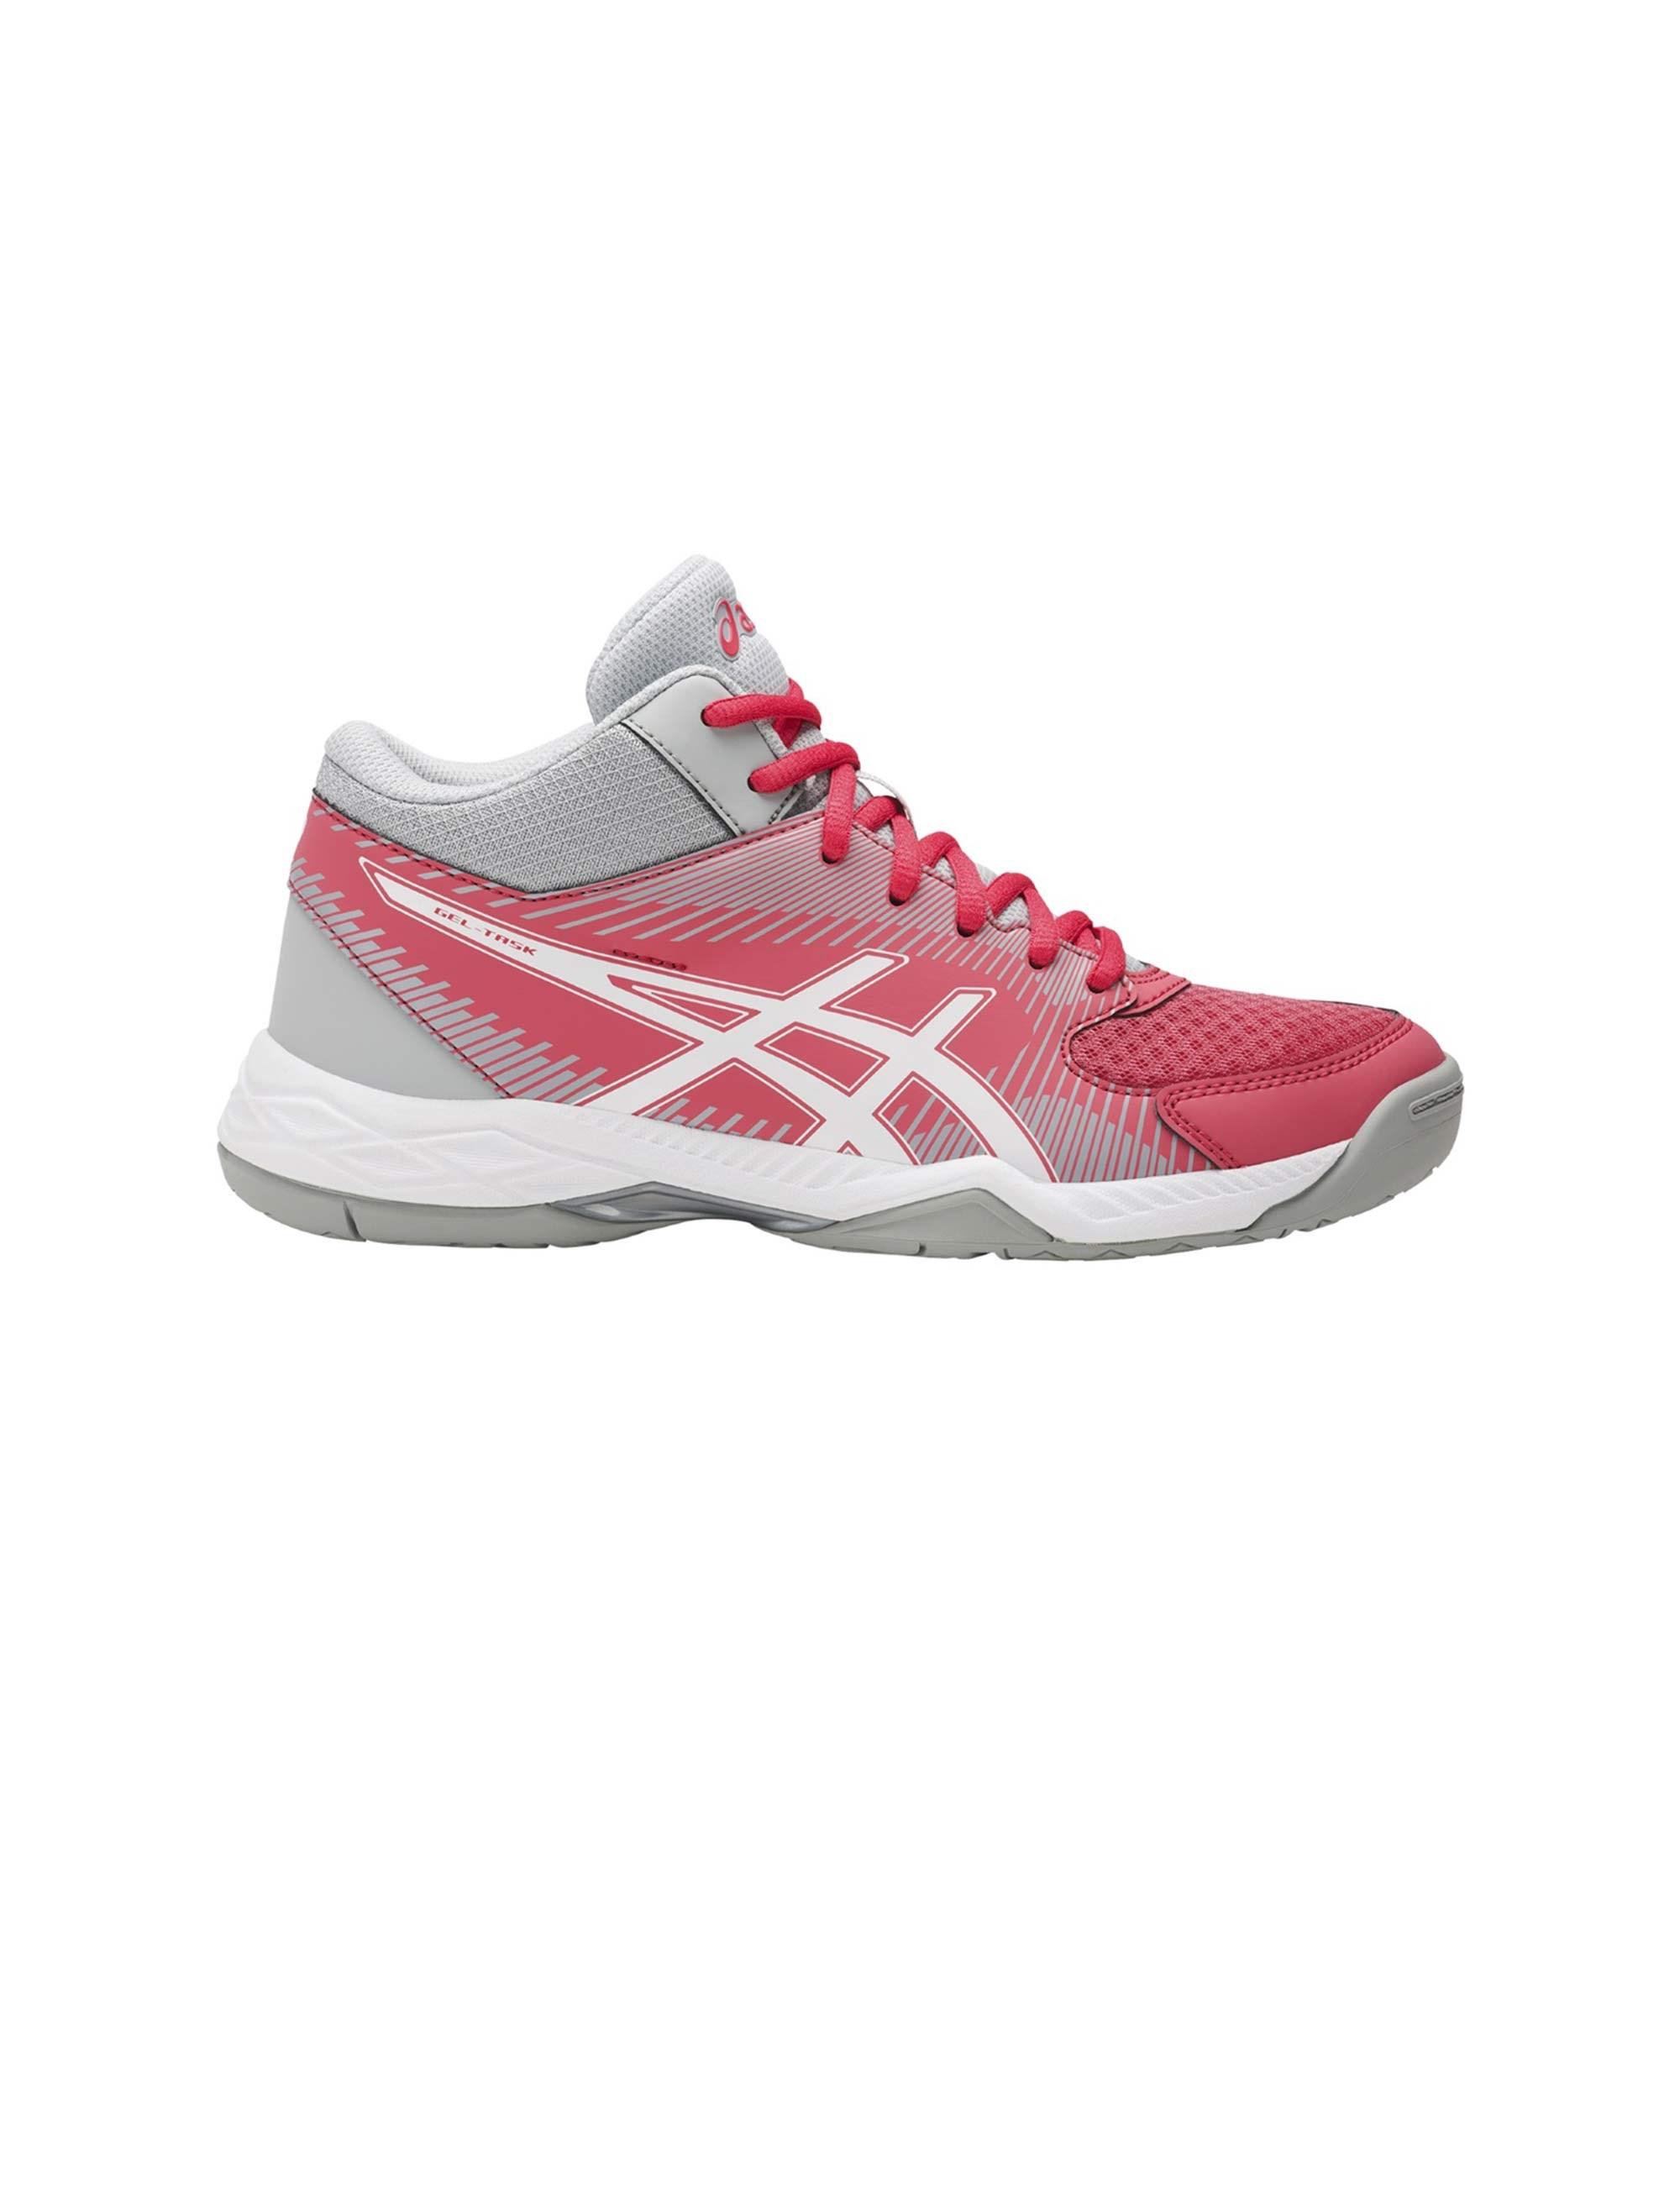 کفش والیبال بندی زنانه GEL-TASK MT - اسیکس